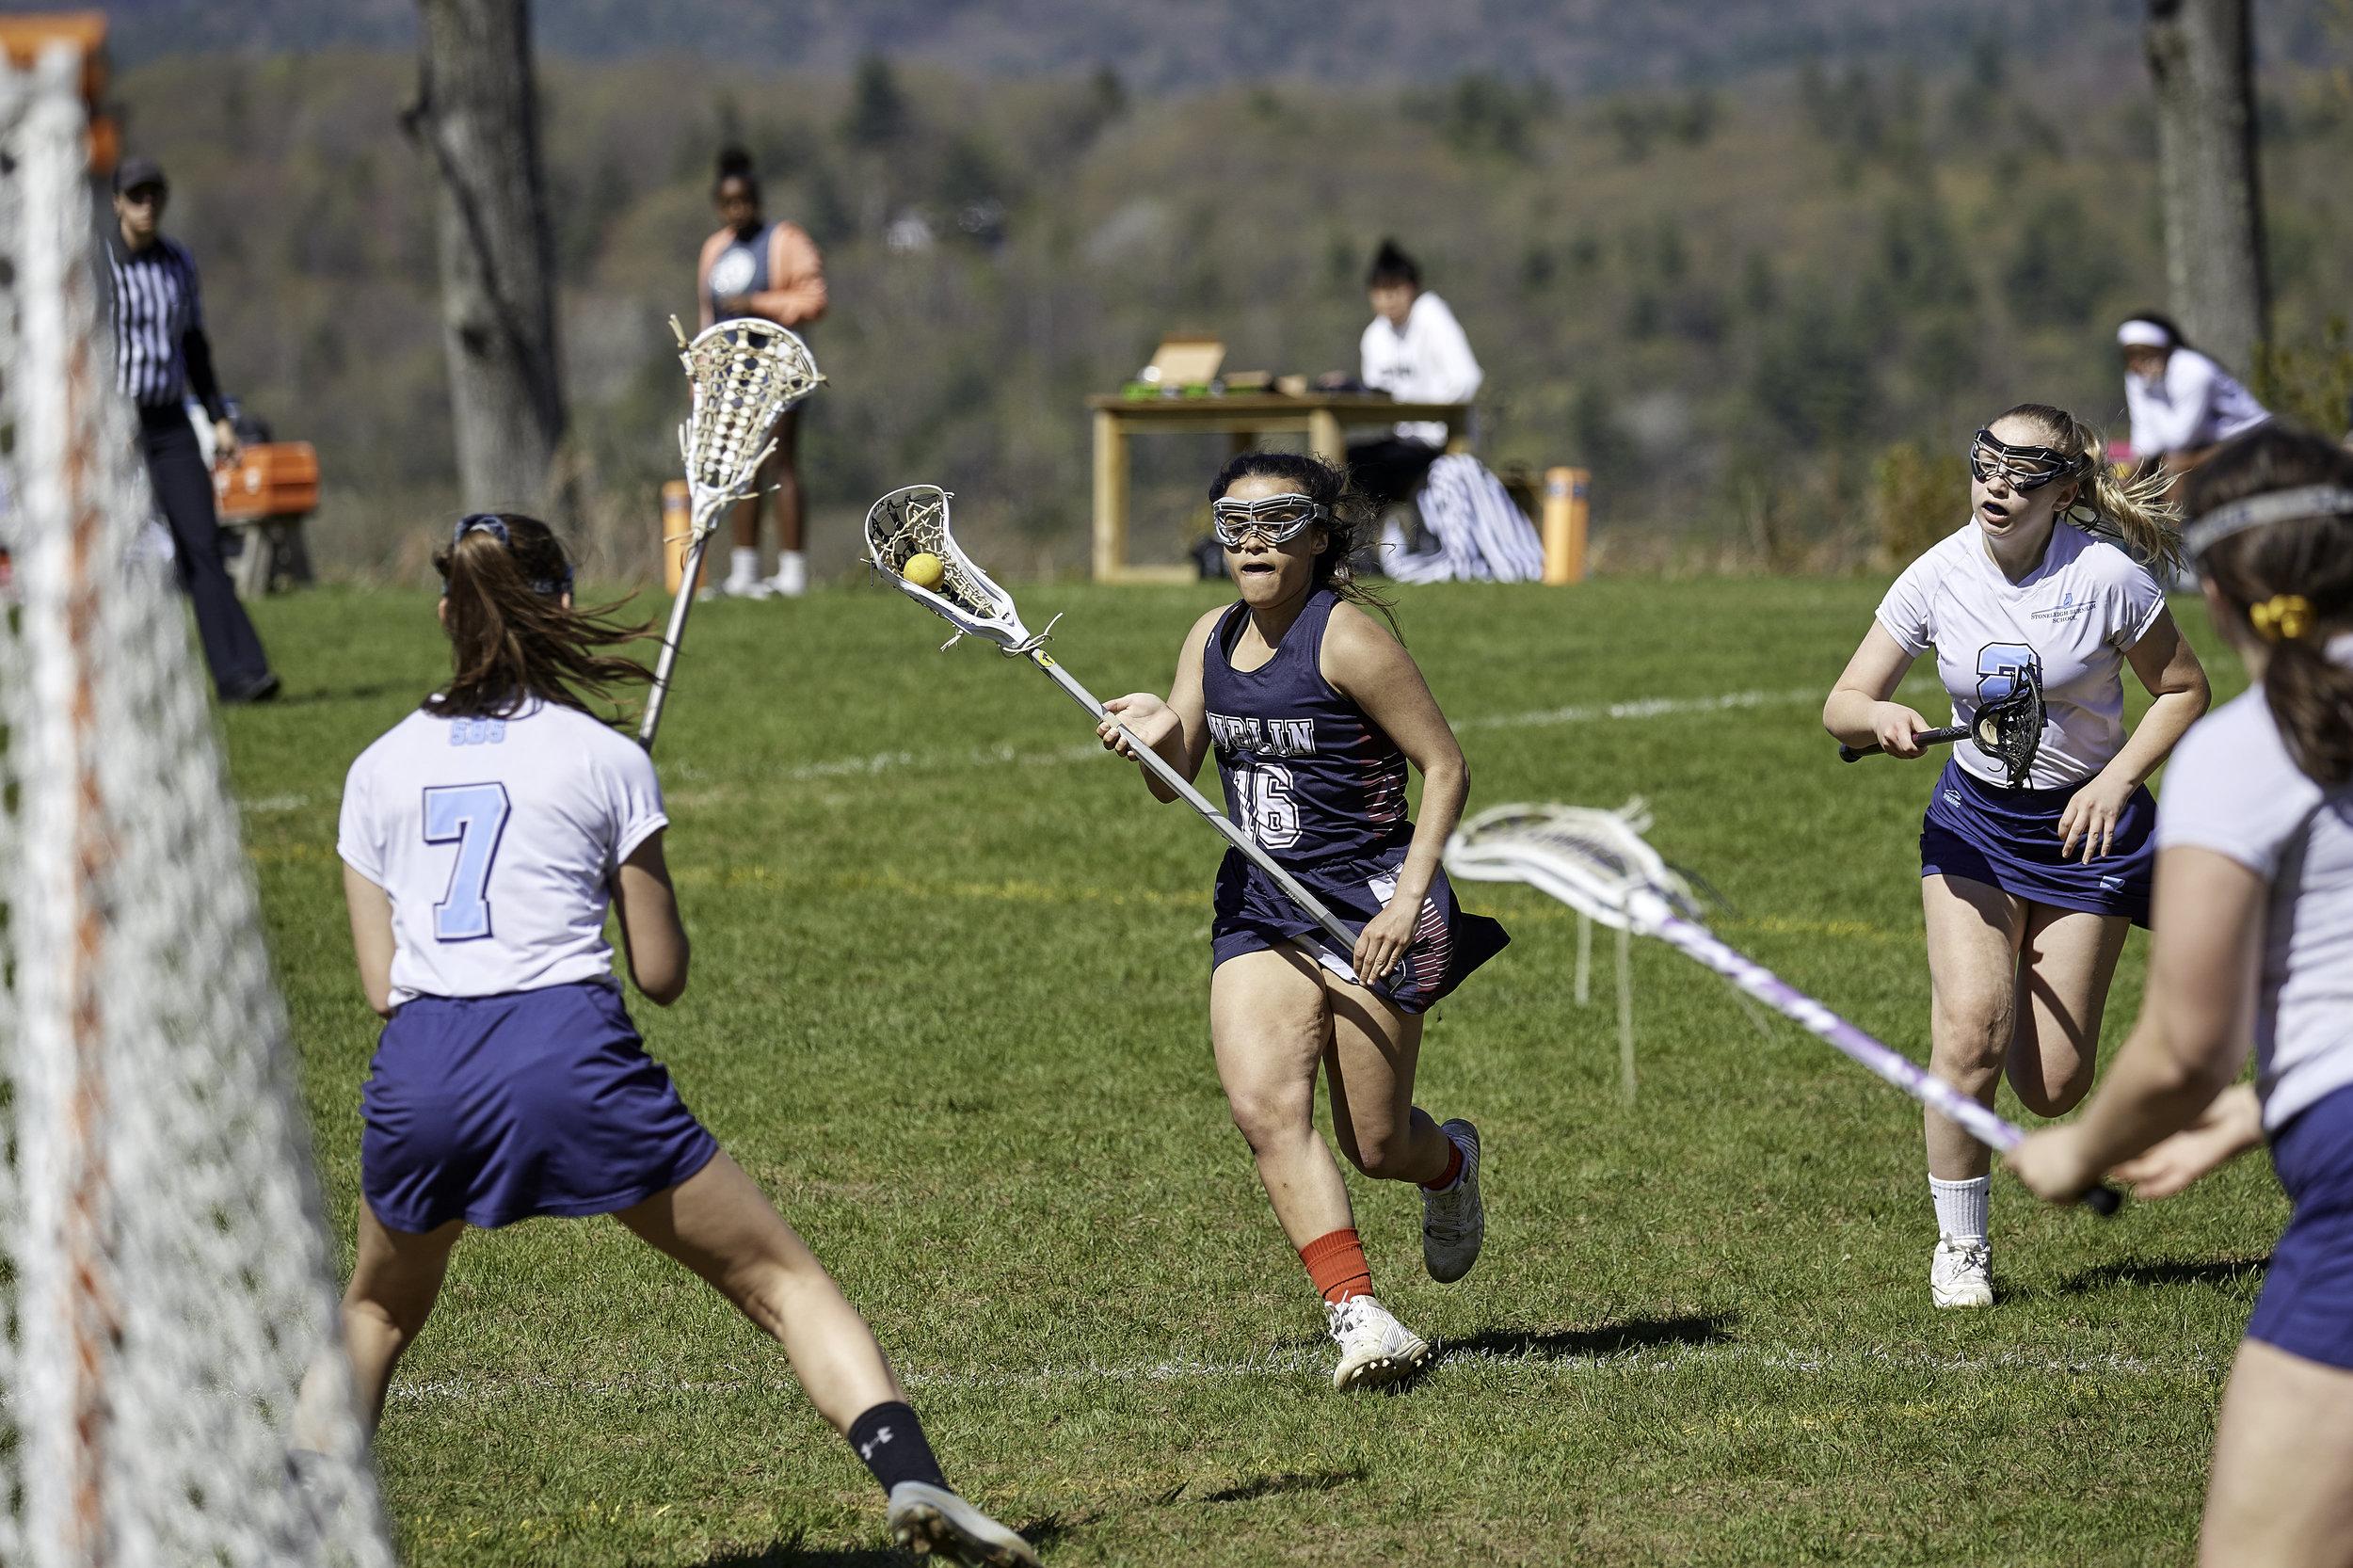 Girls Lacrosse vs. Stoneleigh Burnham School - May 11, 2019 - May 10, 2019193435.jpg